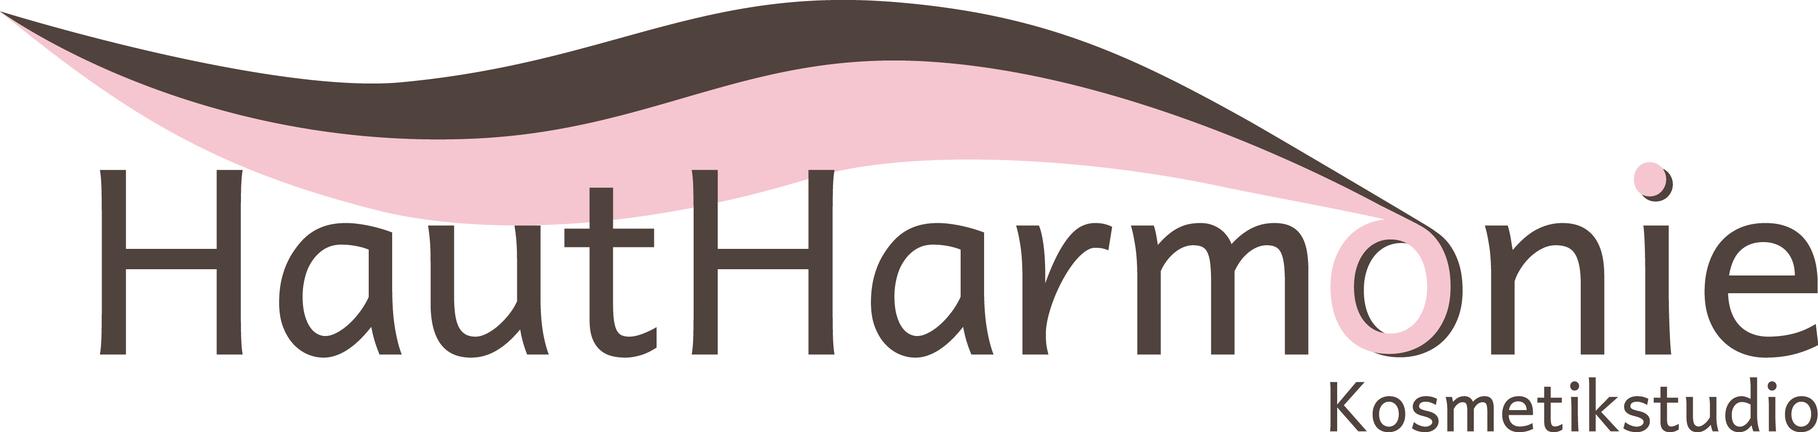 Kosmetikstudio Hautharmonie 2013